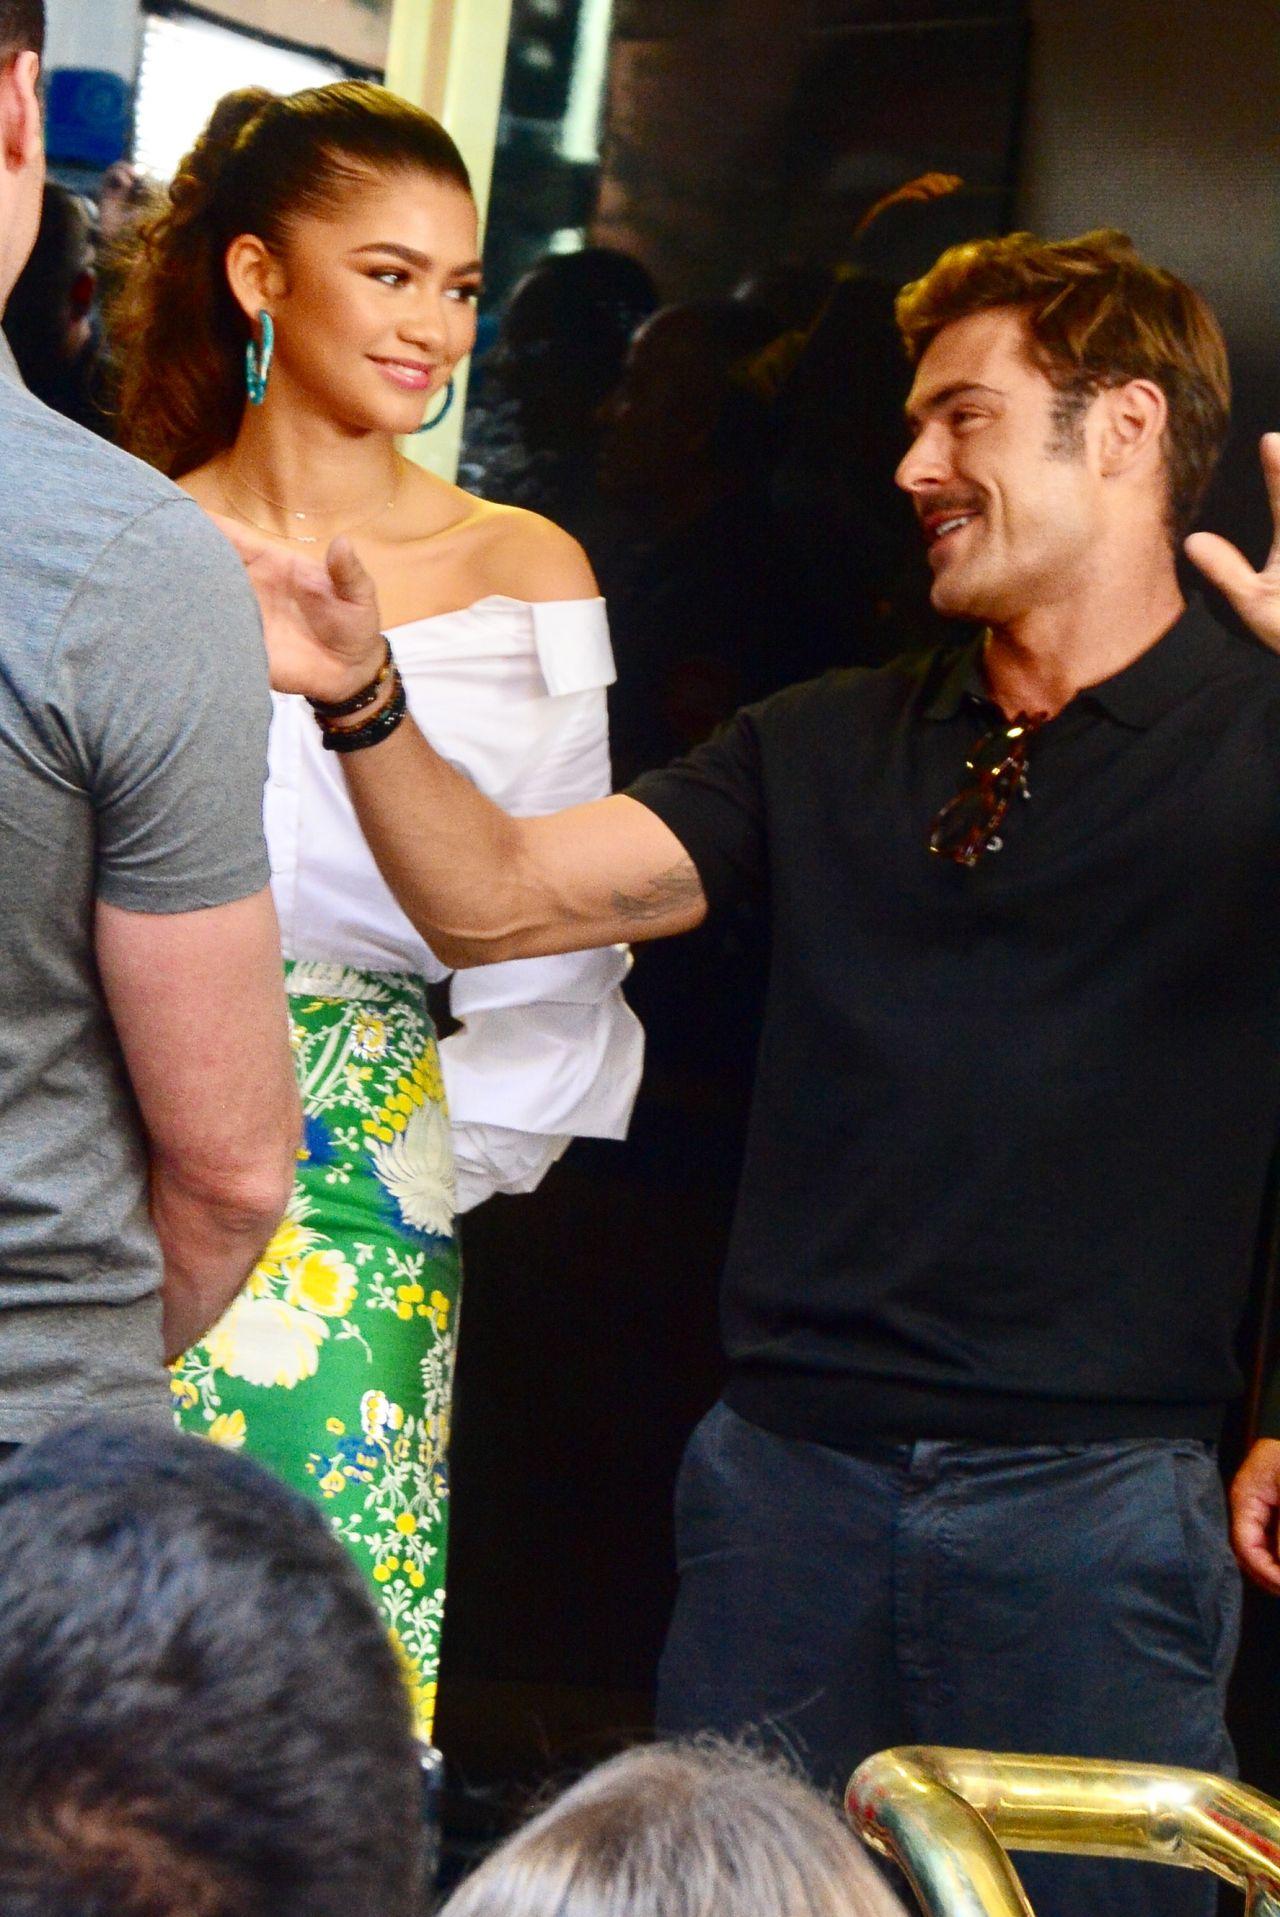 Zendaya Zac Efron And Hugh Jackman Sunrise Show In